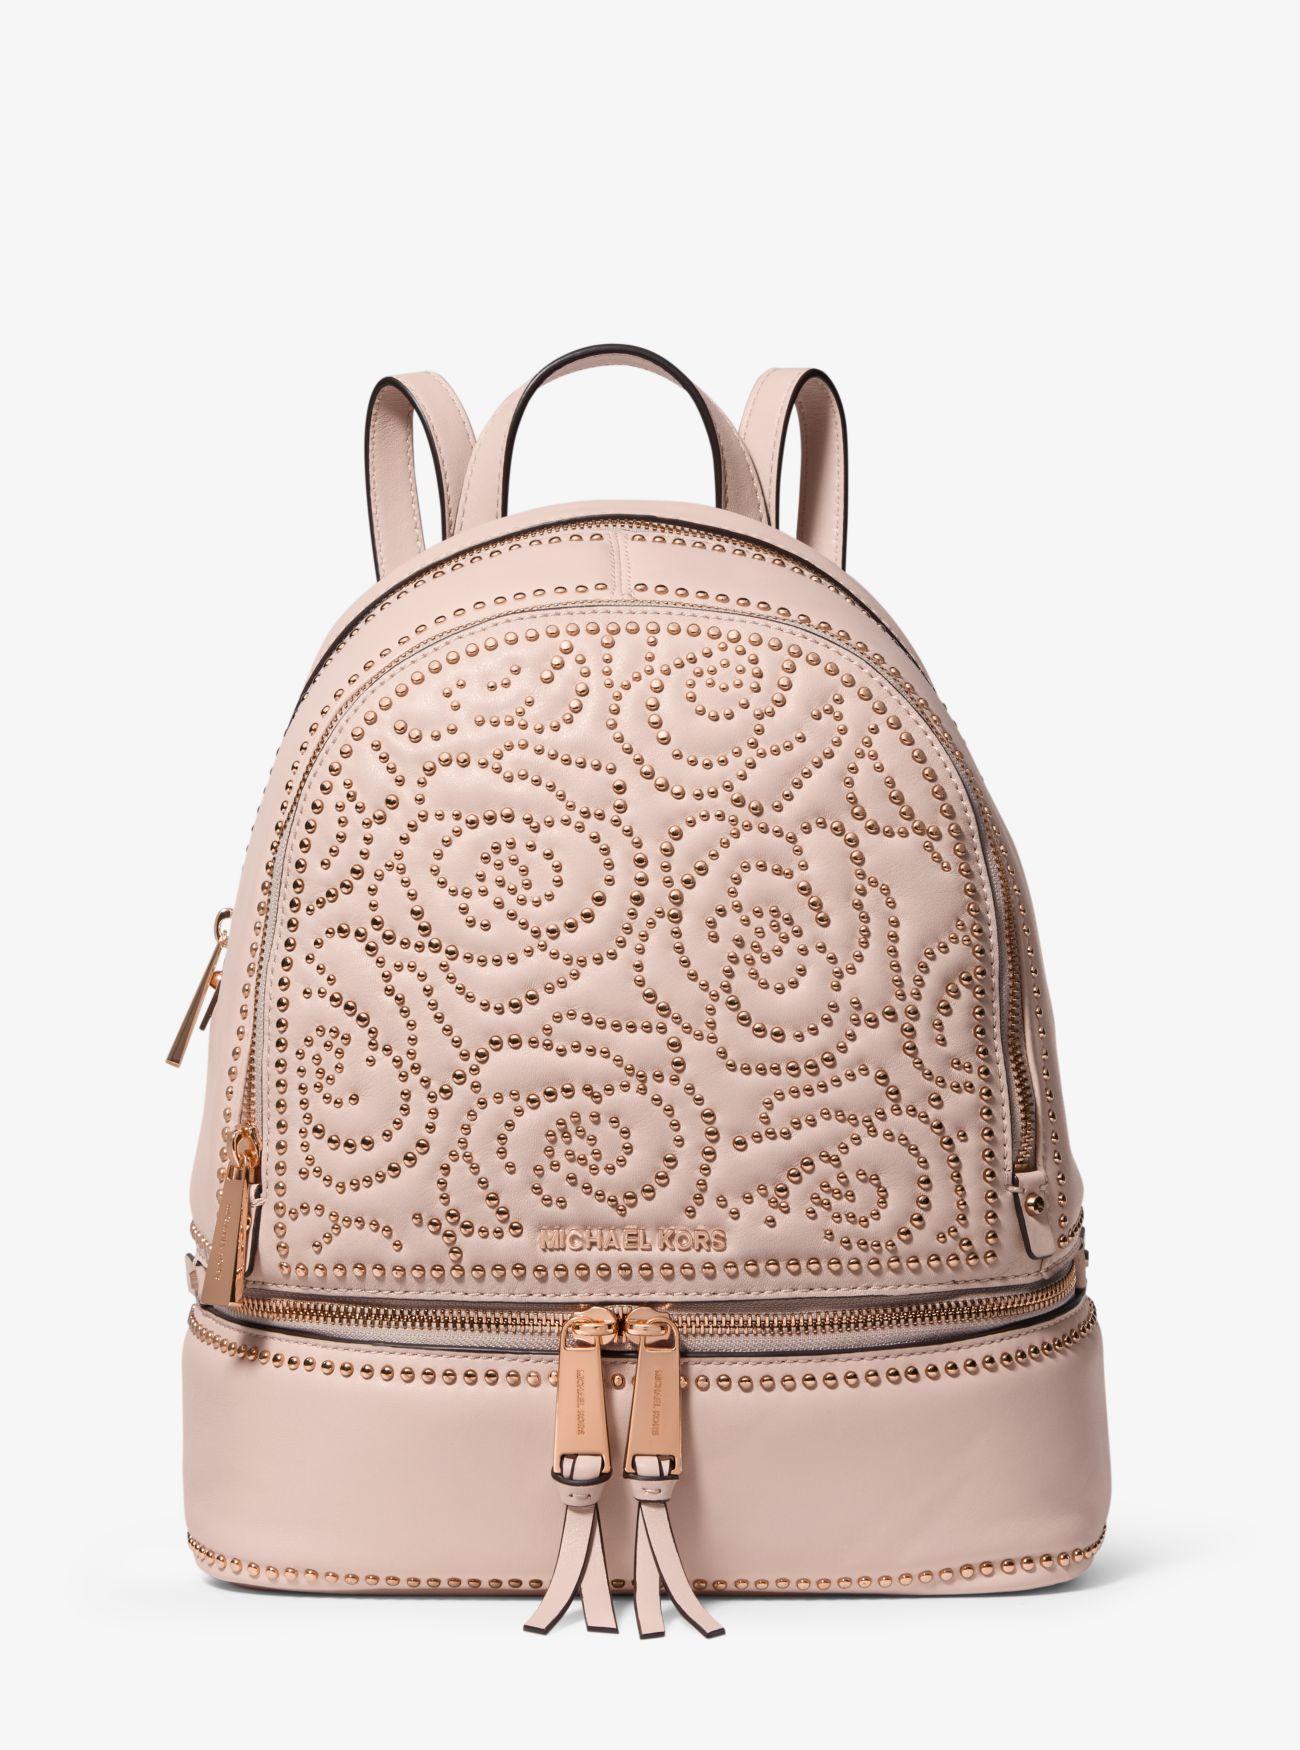 f8998c4b8507 Michael Kors - Pink Rhea Medium Rose Studded Leather Backpack - Lyst. View  fullscreen